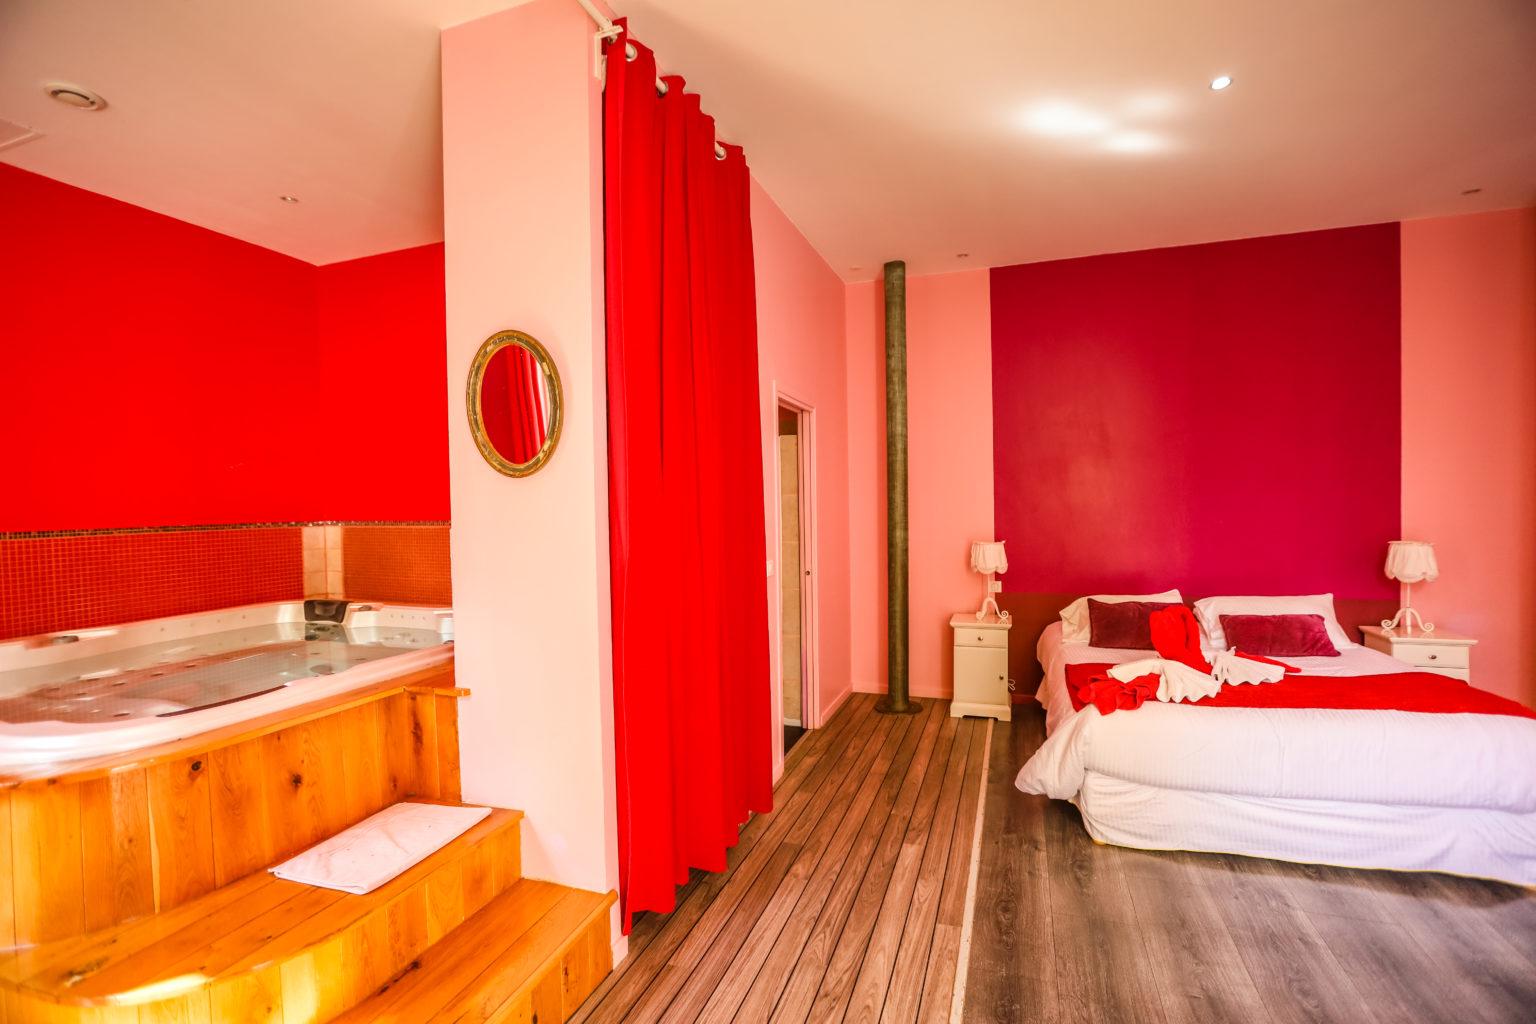 CHAMBRE LA FONTVINEUSE IMG_1650LA FONT VINEUSE HOTEL & SPA